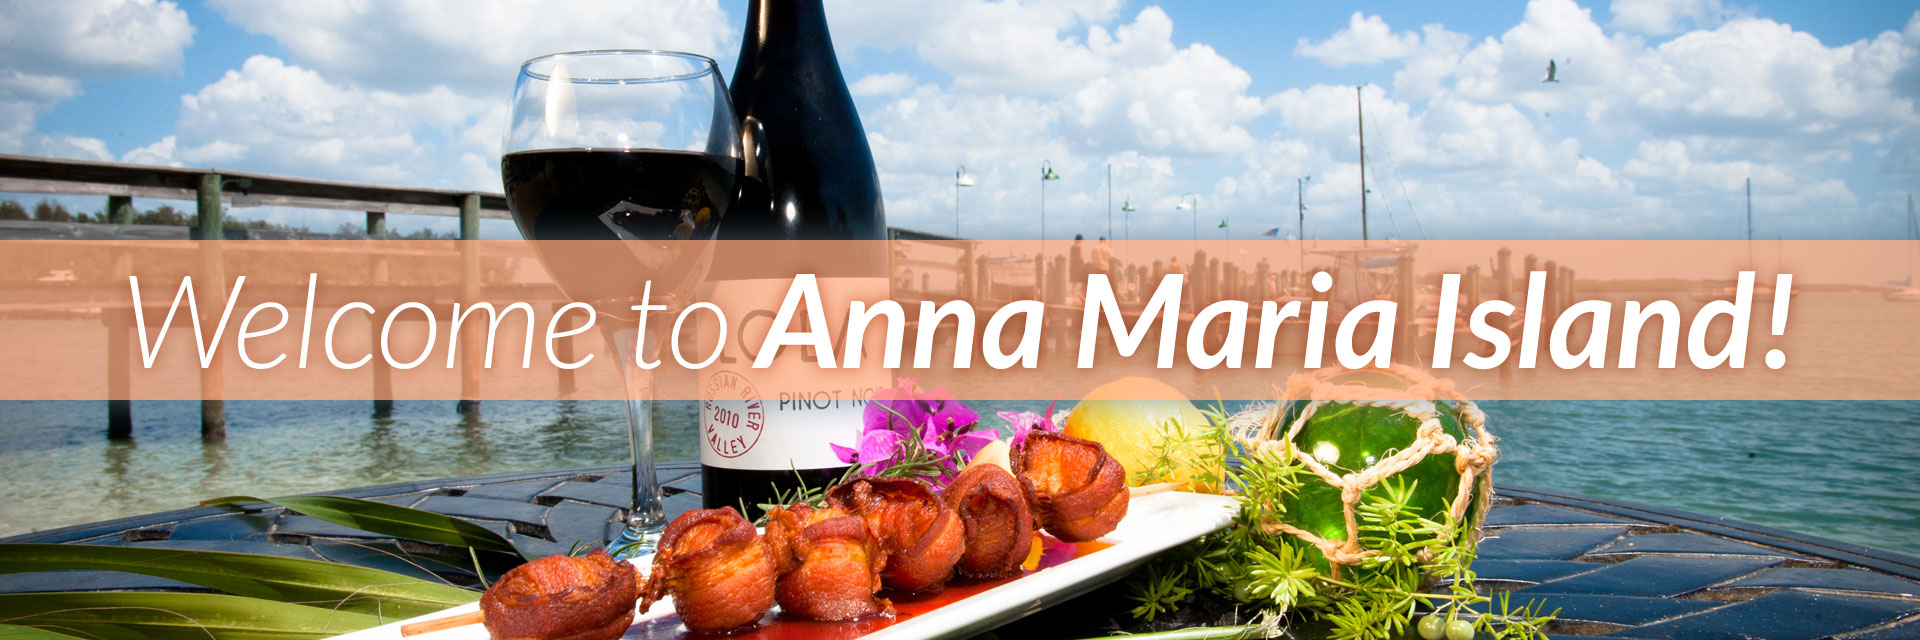 Welcome to Anna Maria Island!